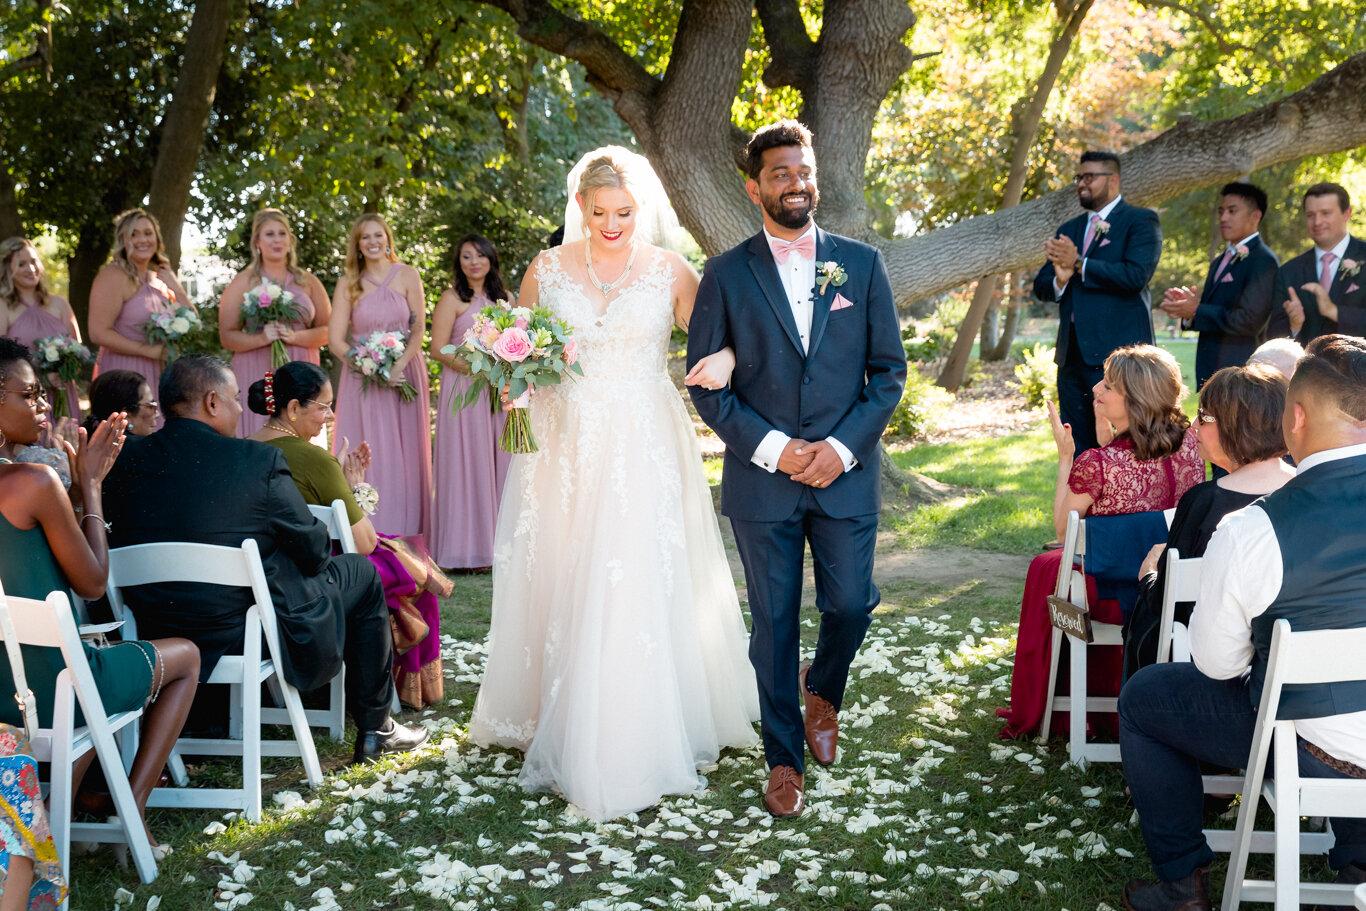 2019.08.24_Emily-Ashir-Wedding-at-the-Maples-5916.jpg